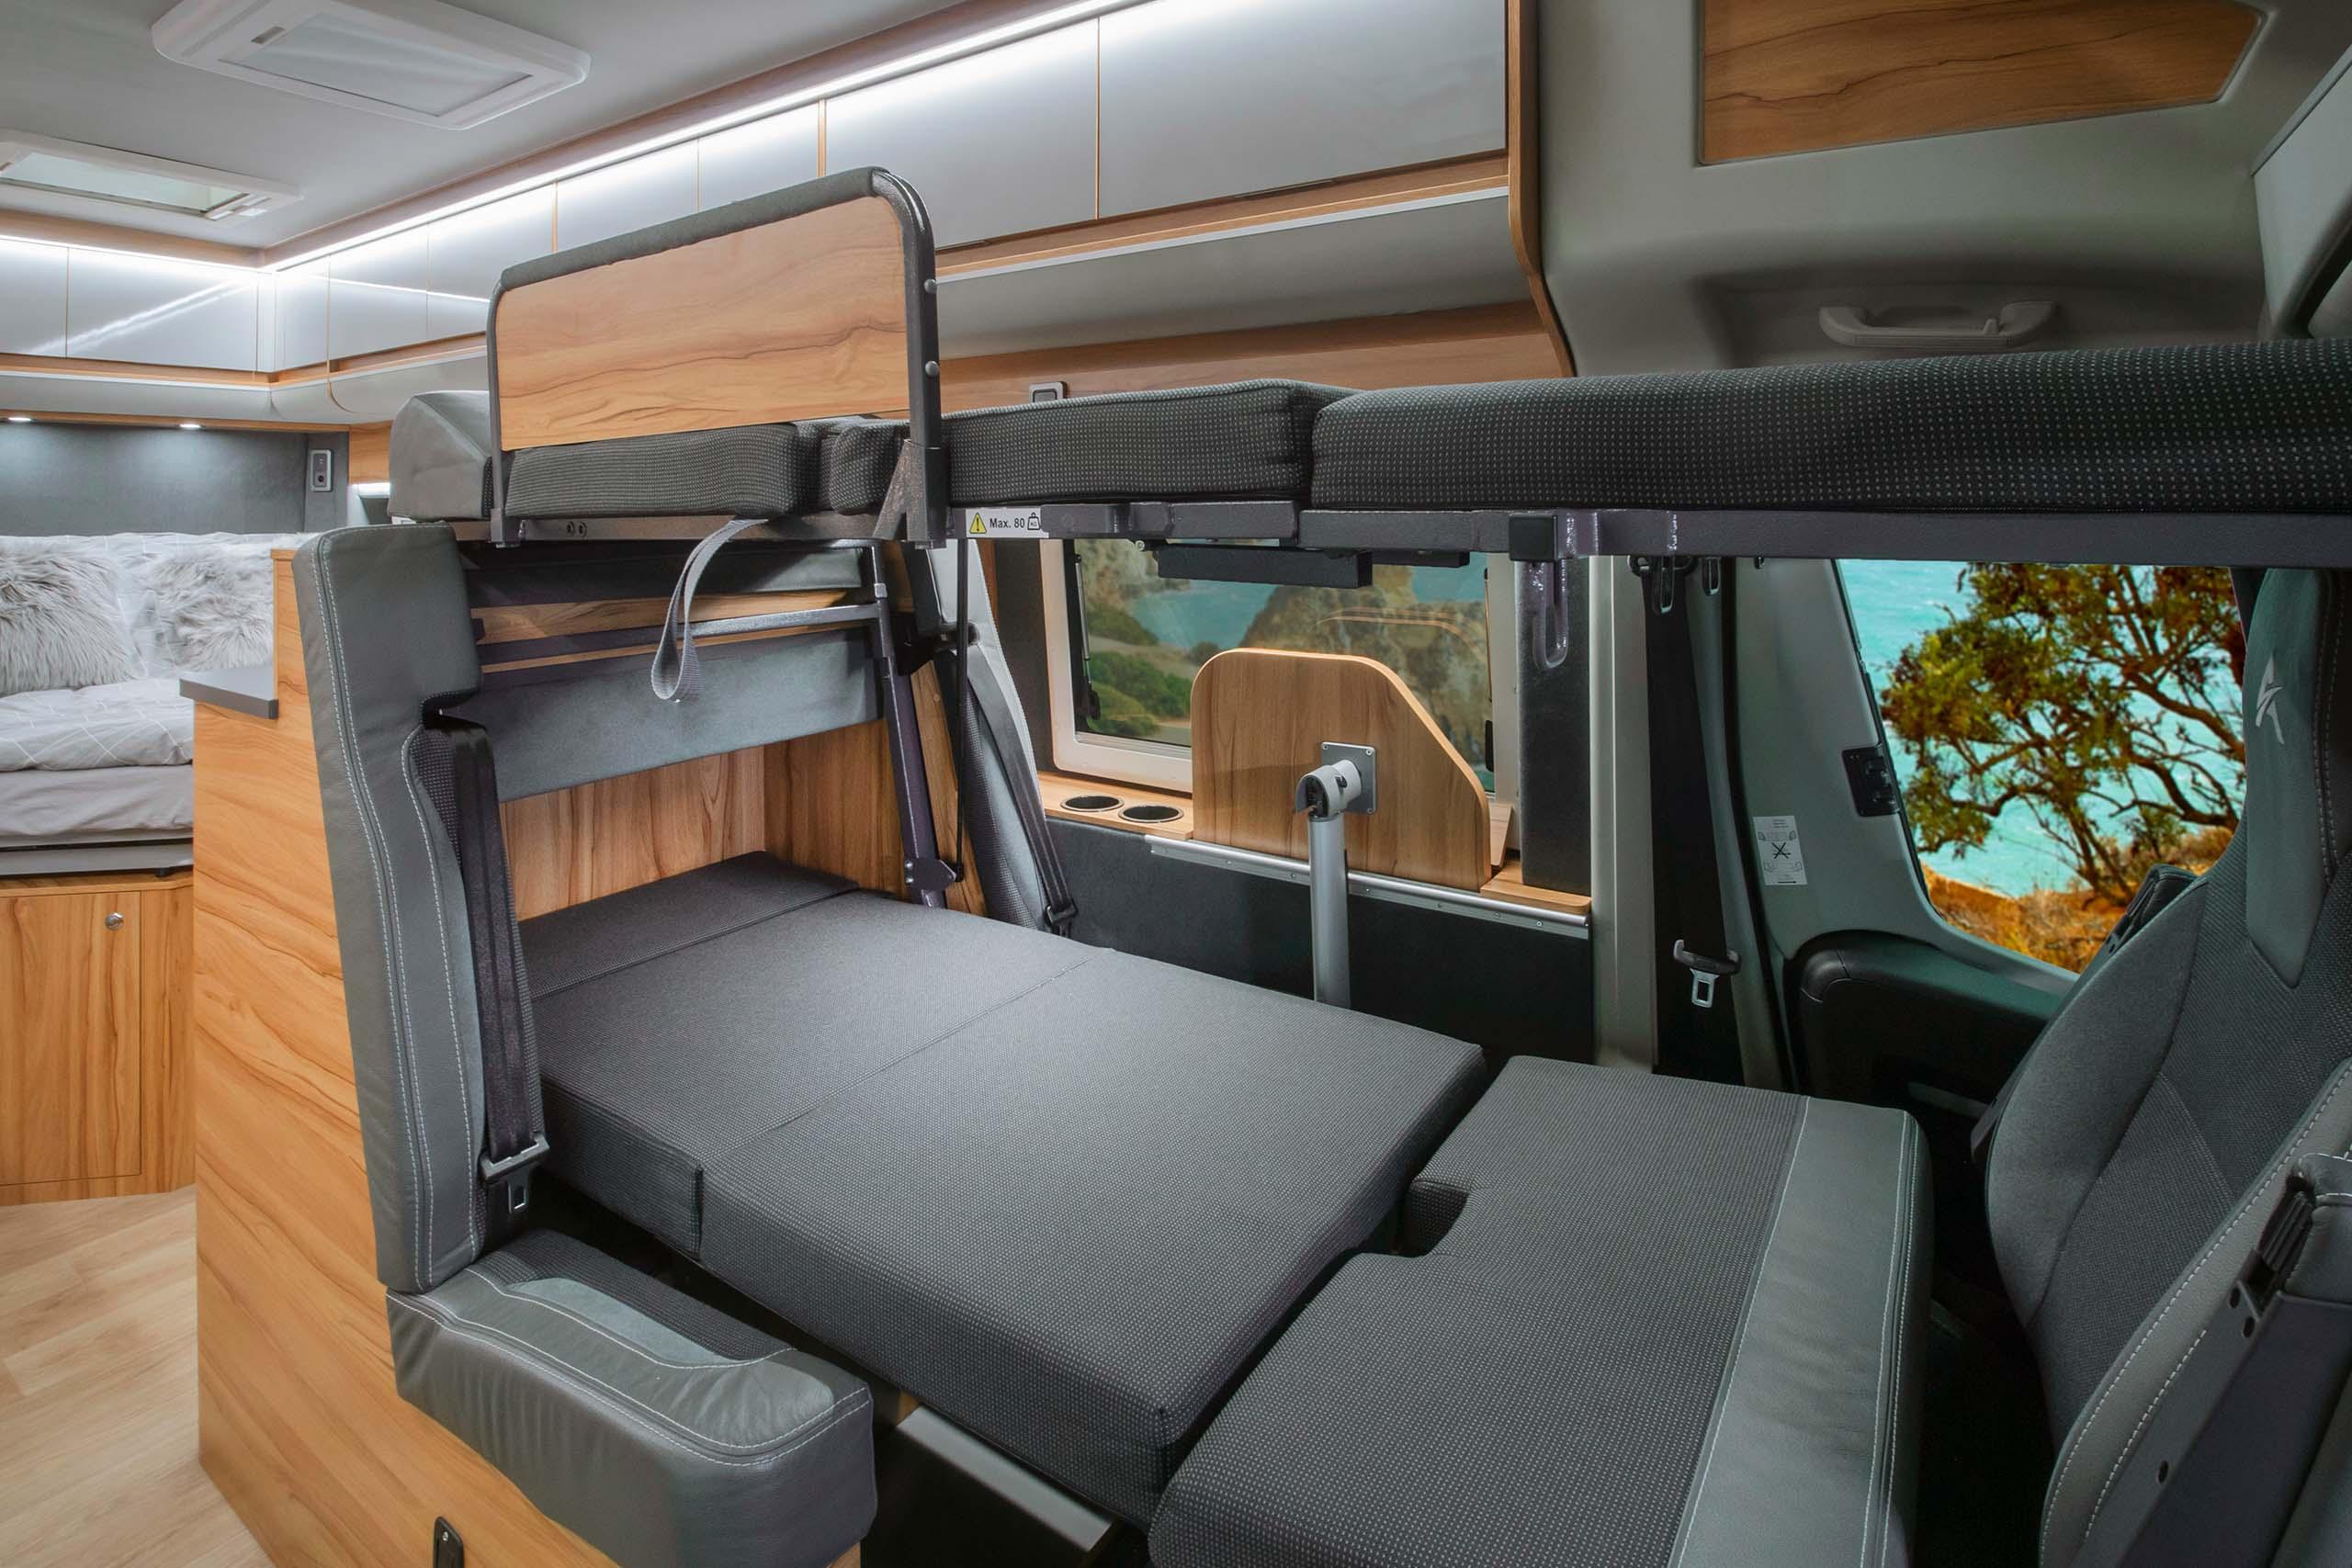 Affinity Camper Van - Interior